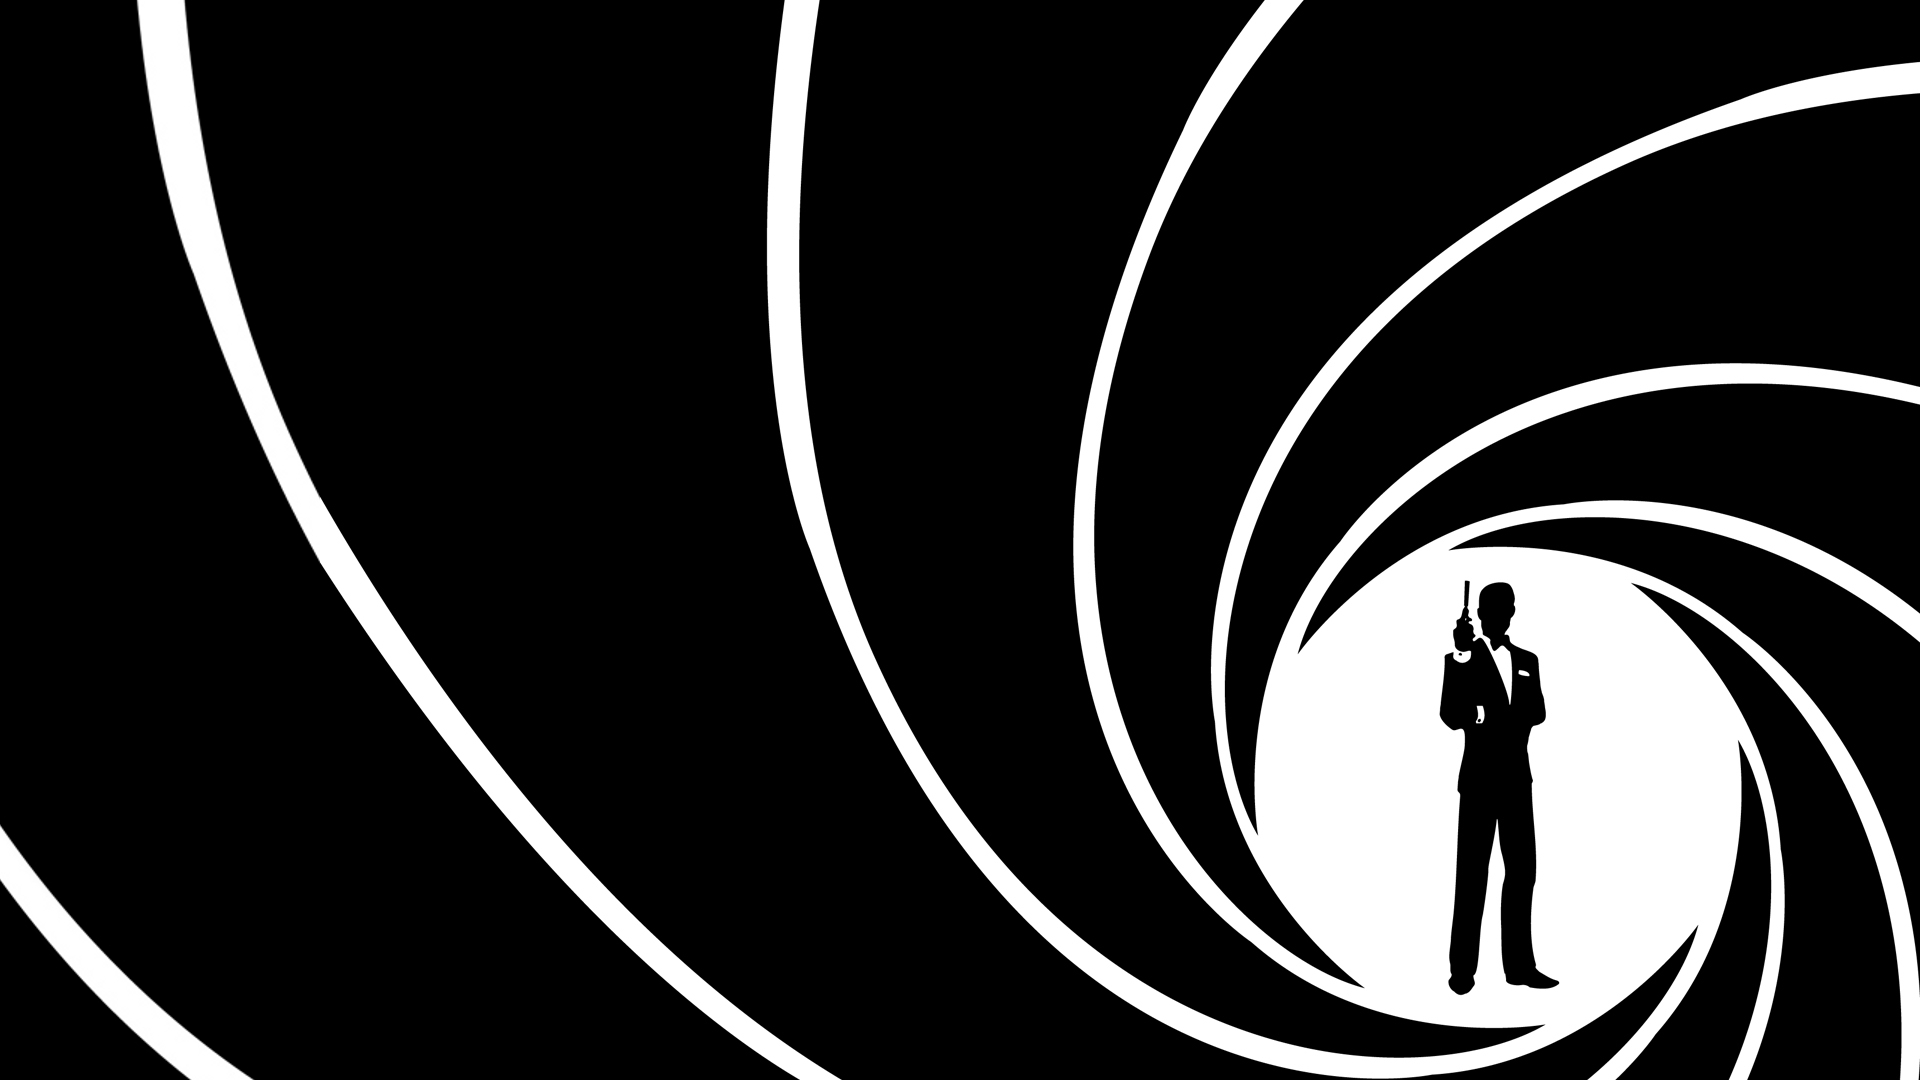 James Bond Wallpaper